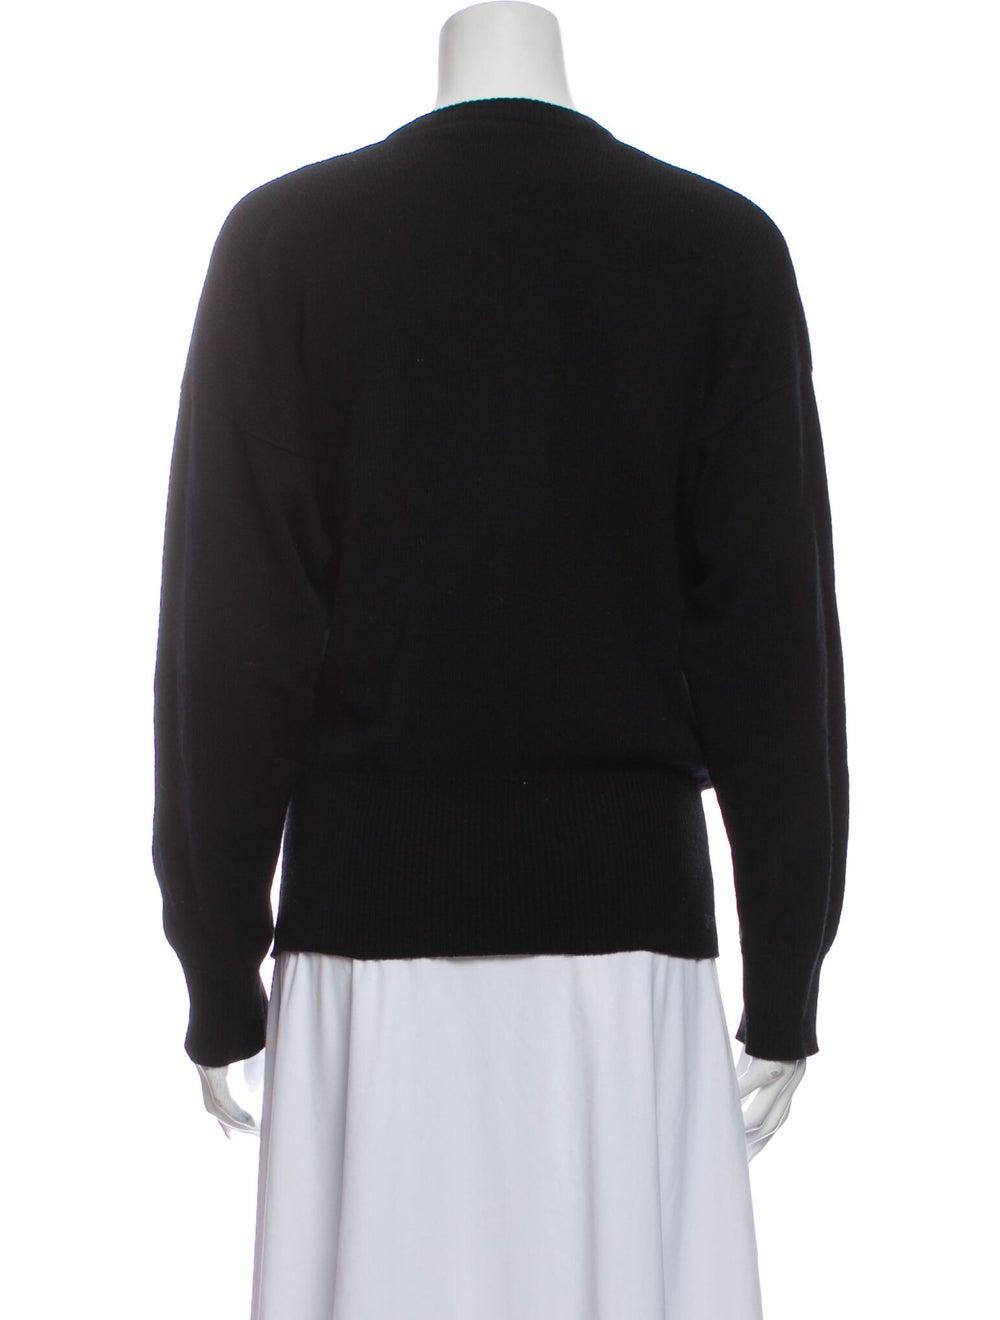 Gucci 1970's Cashmere Sweater Black - image 3